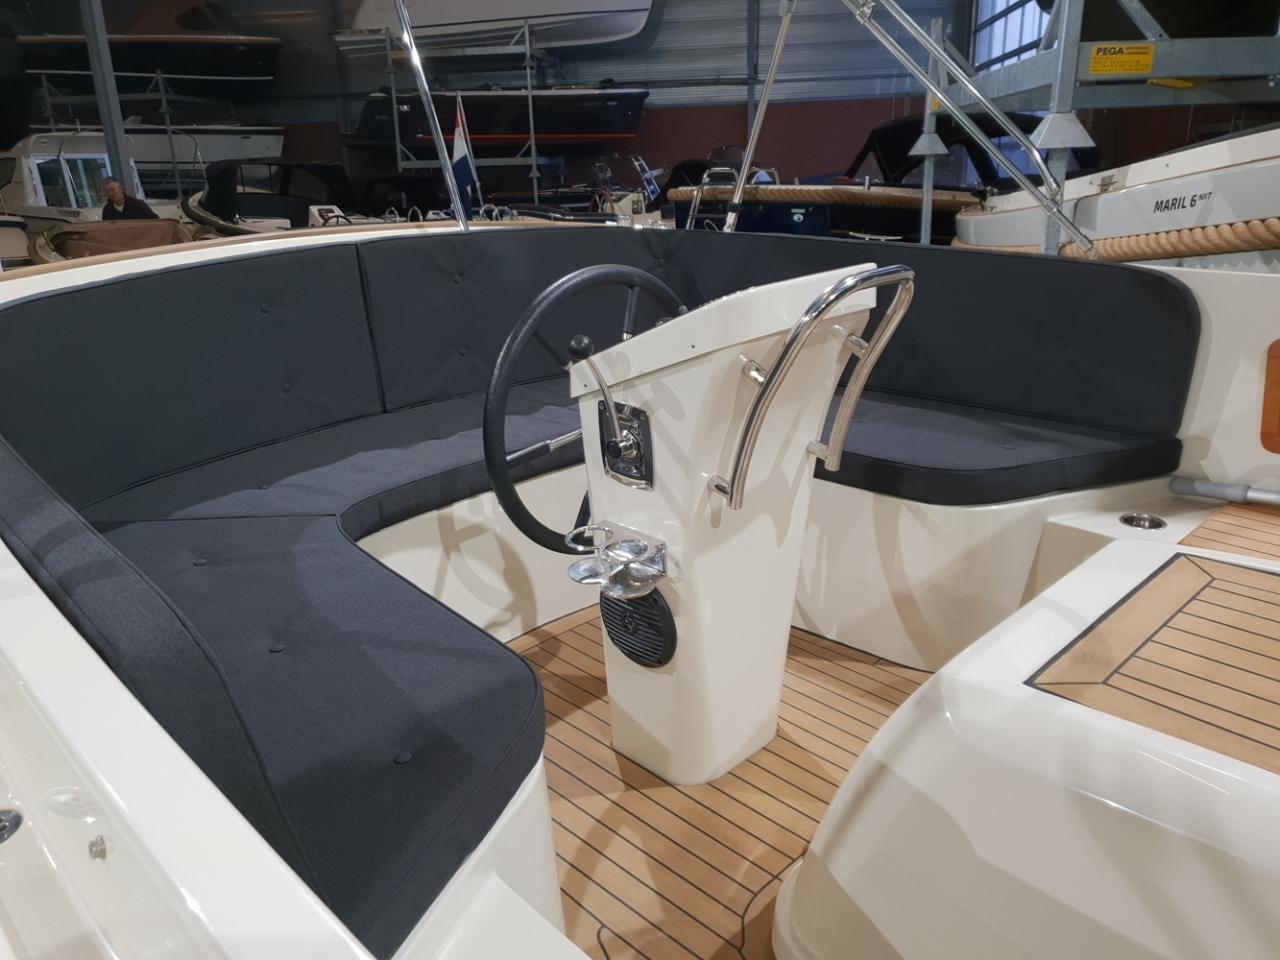 Antaris sixty6 offwhite met Vetus 42 pk  5